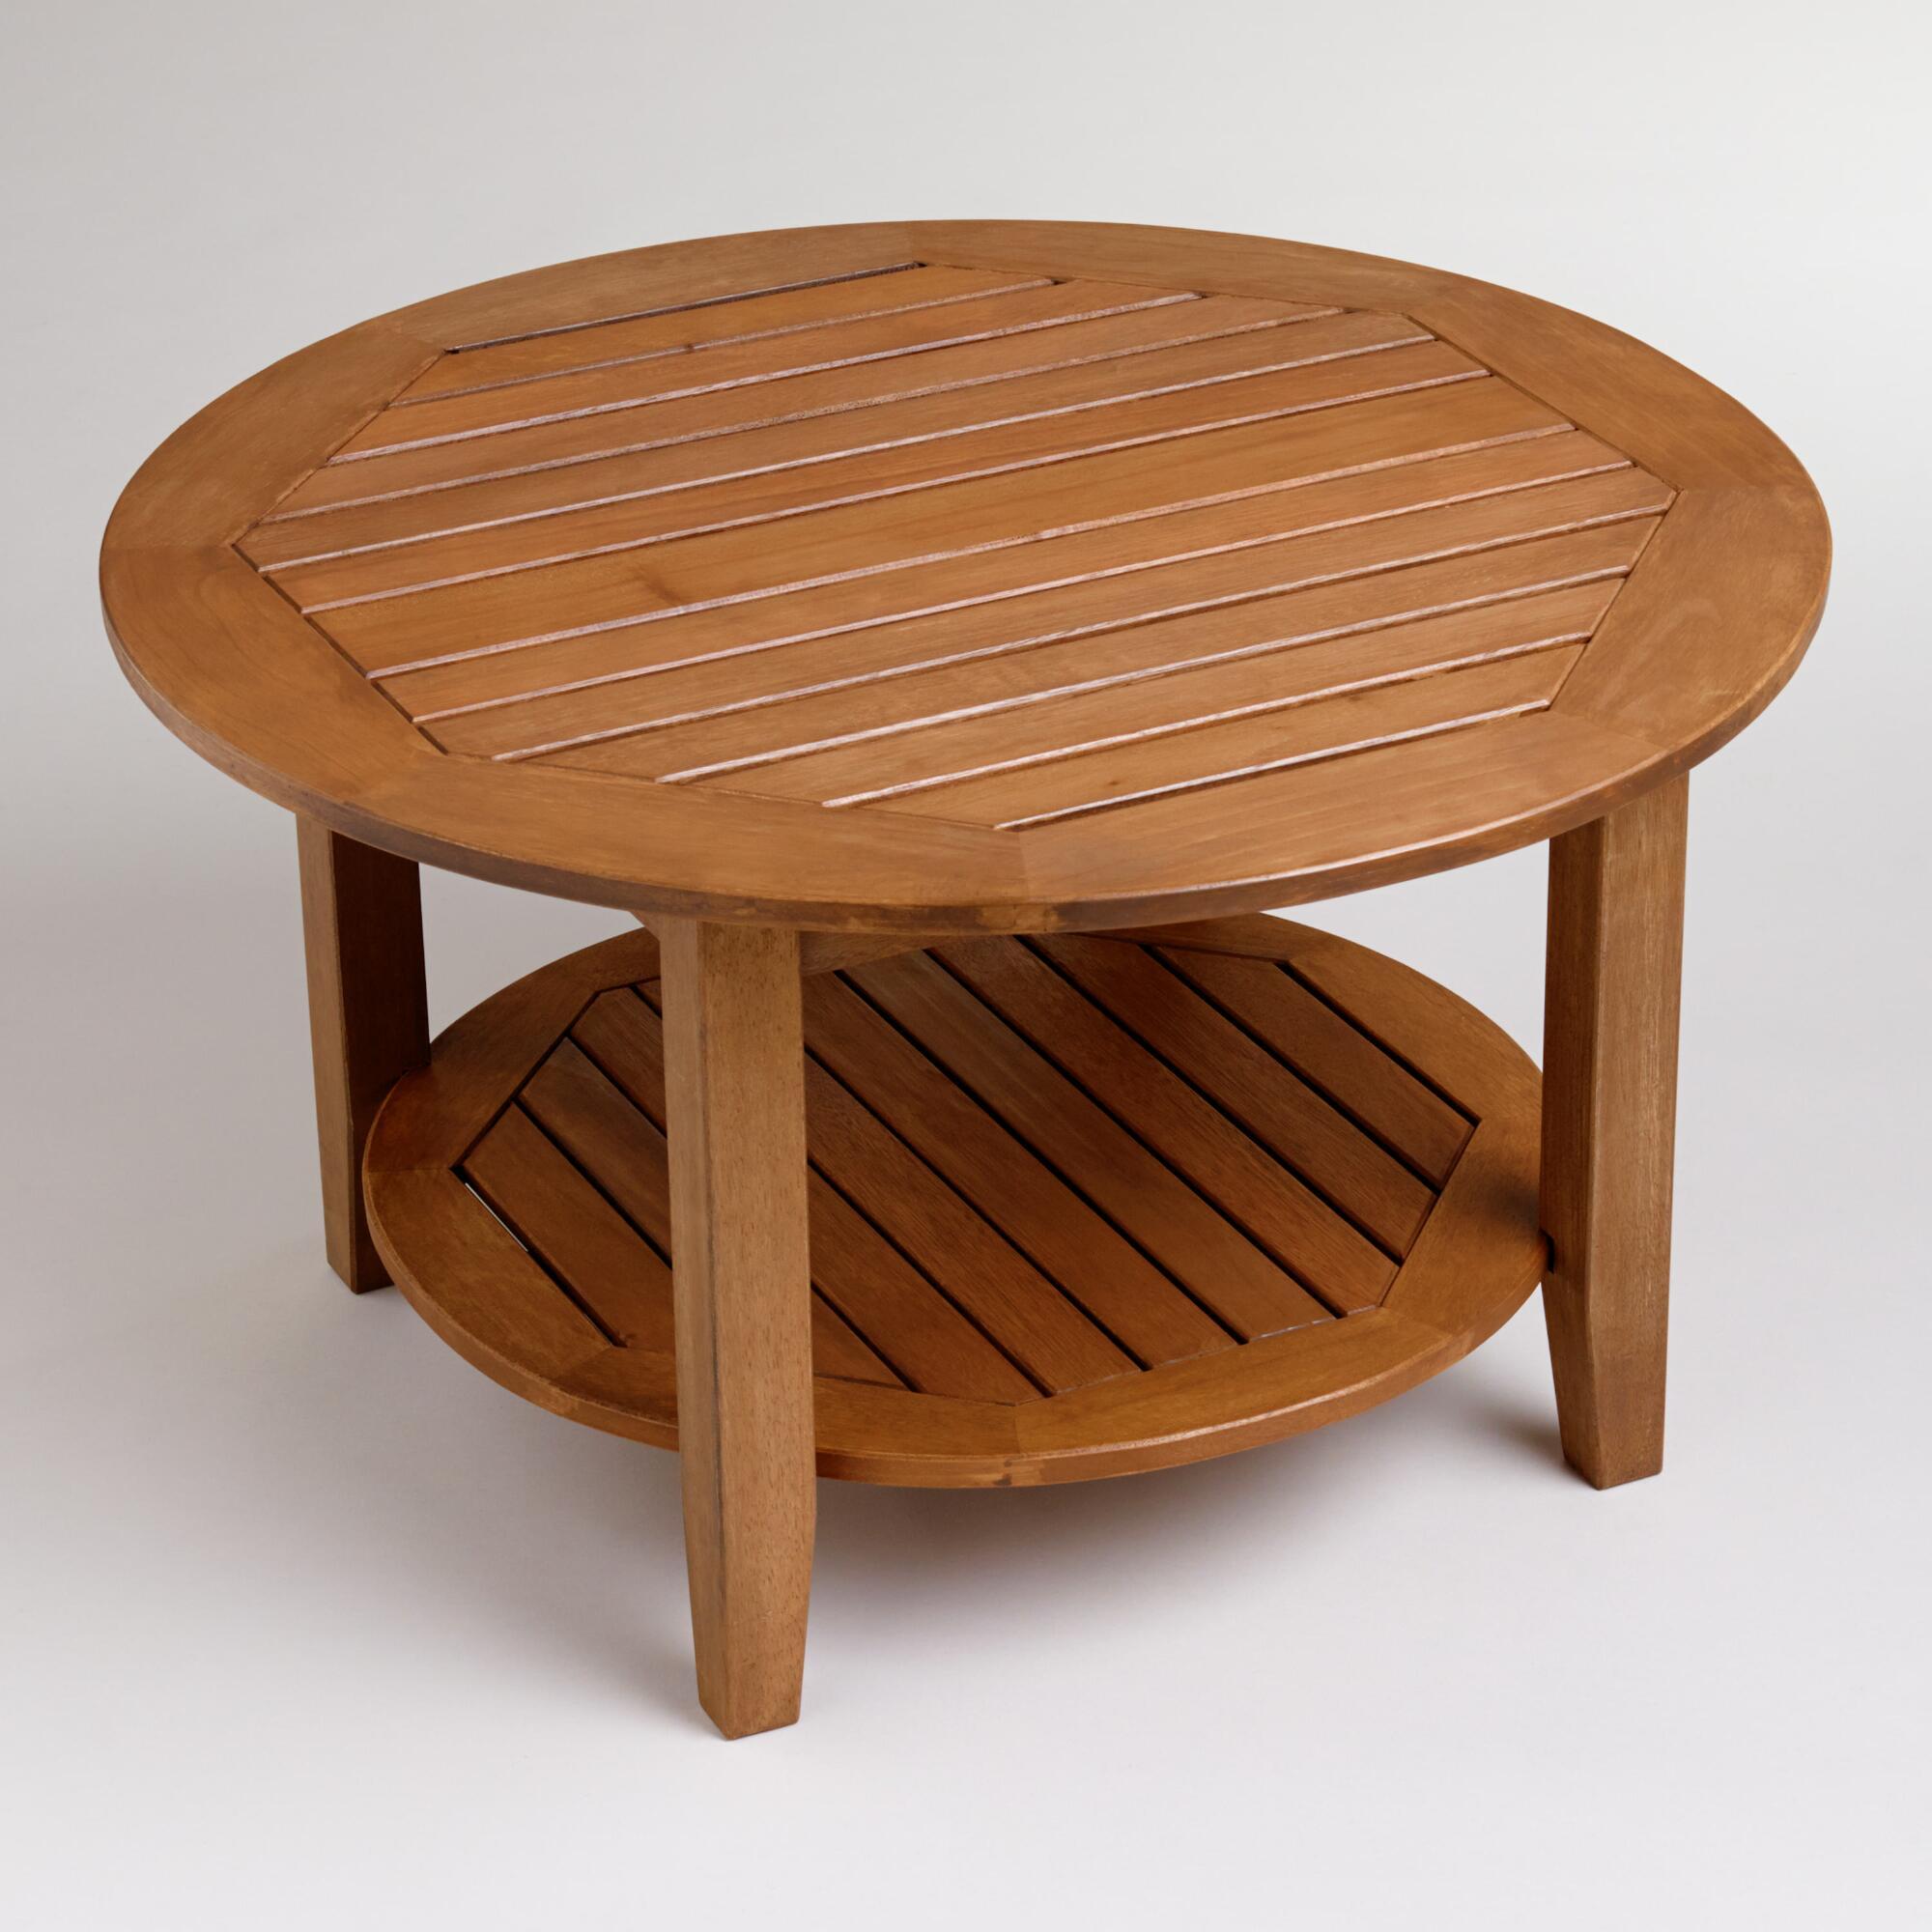 Wood St Martin Coffee Table | World Market